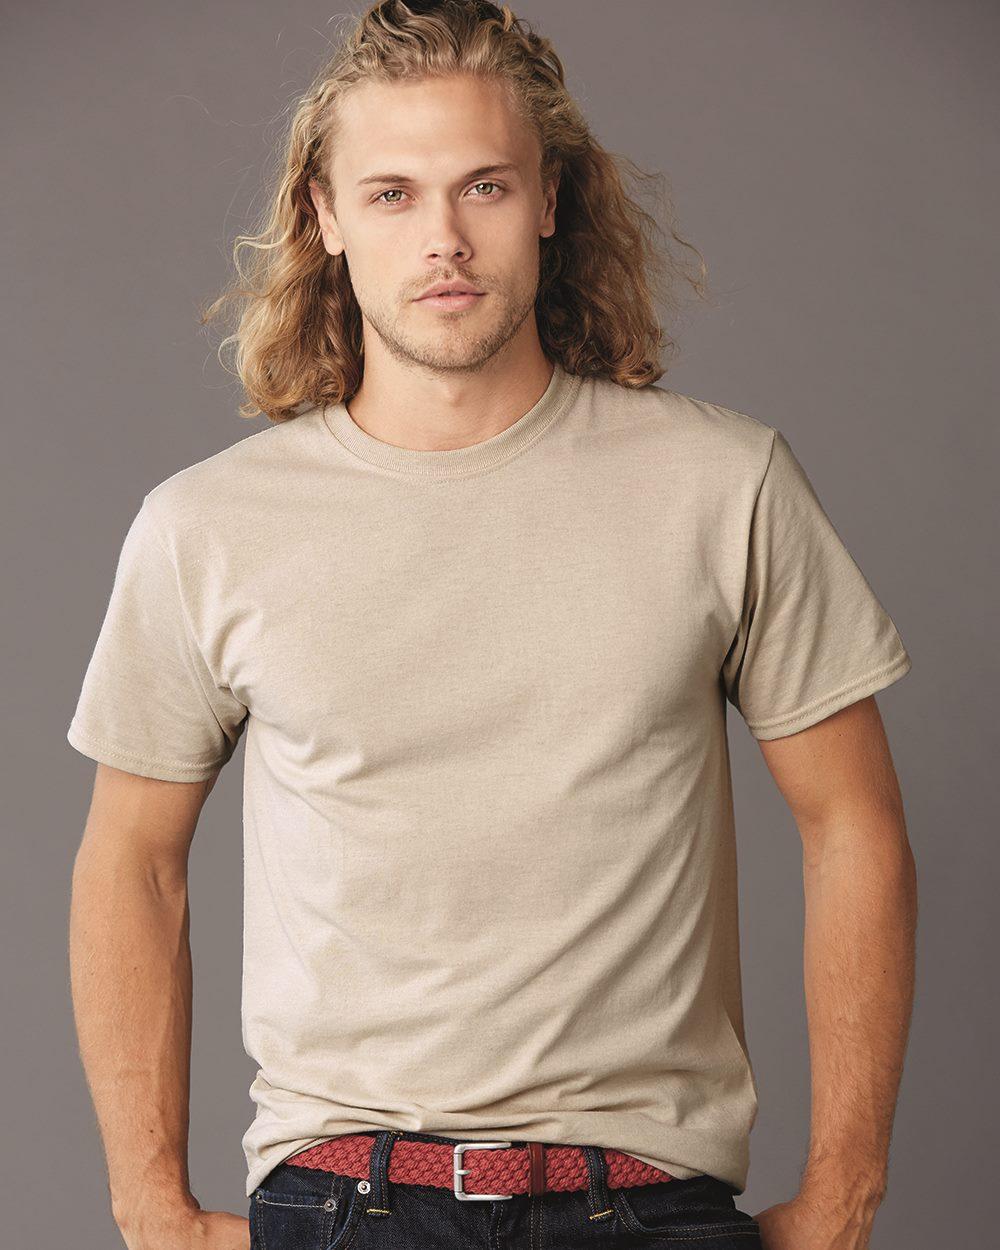 Jerzees Dri Power Active 50/50 T-shirt - 29M       Starting at $3.00 Blank